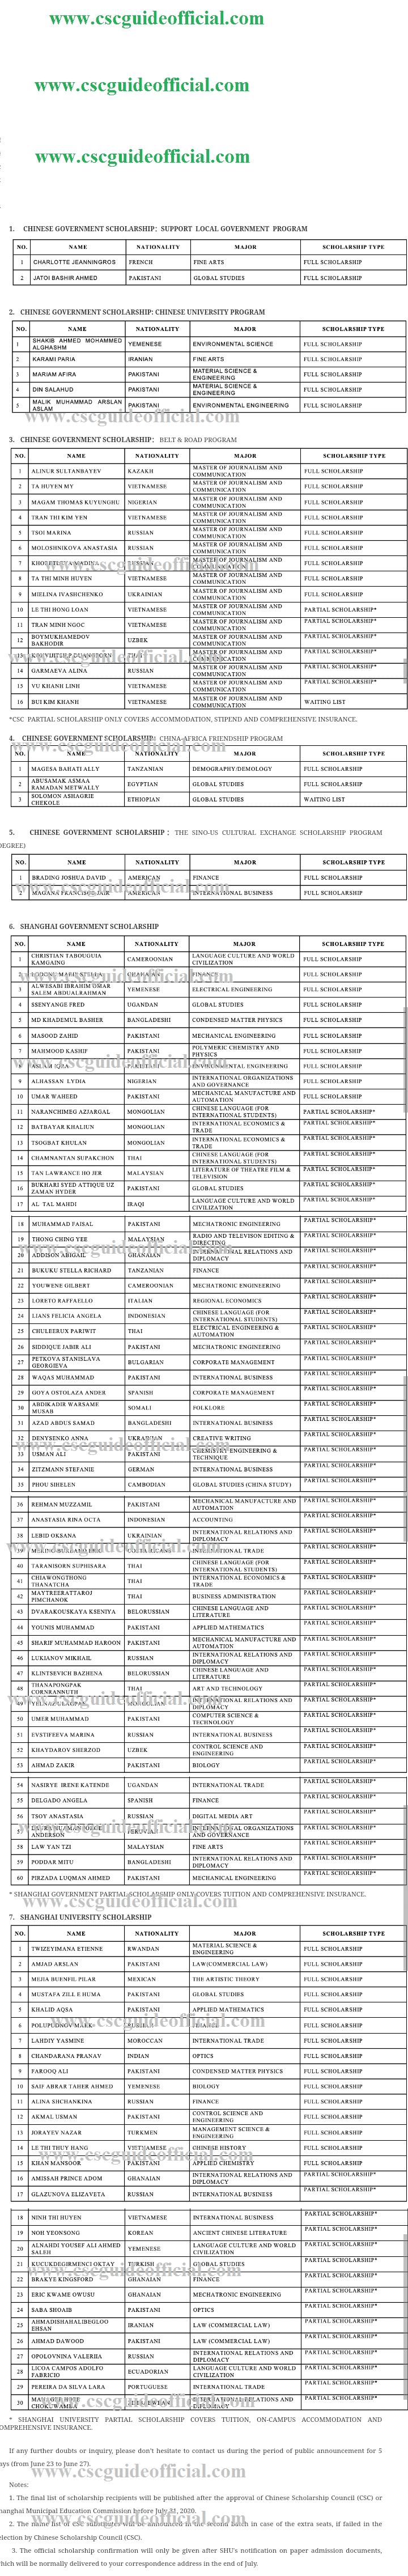 shanghai university scholarship result 2020